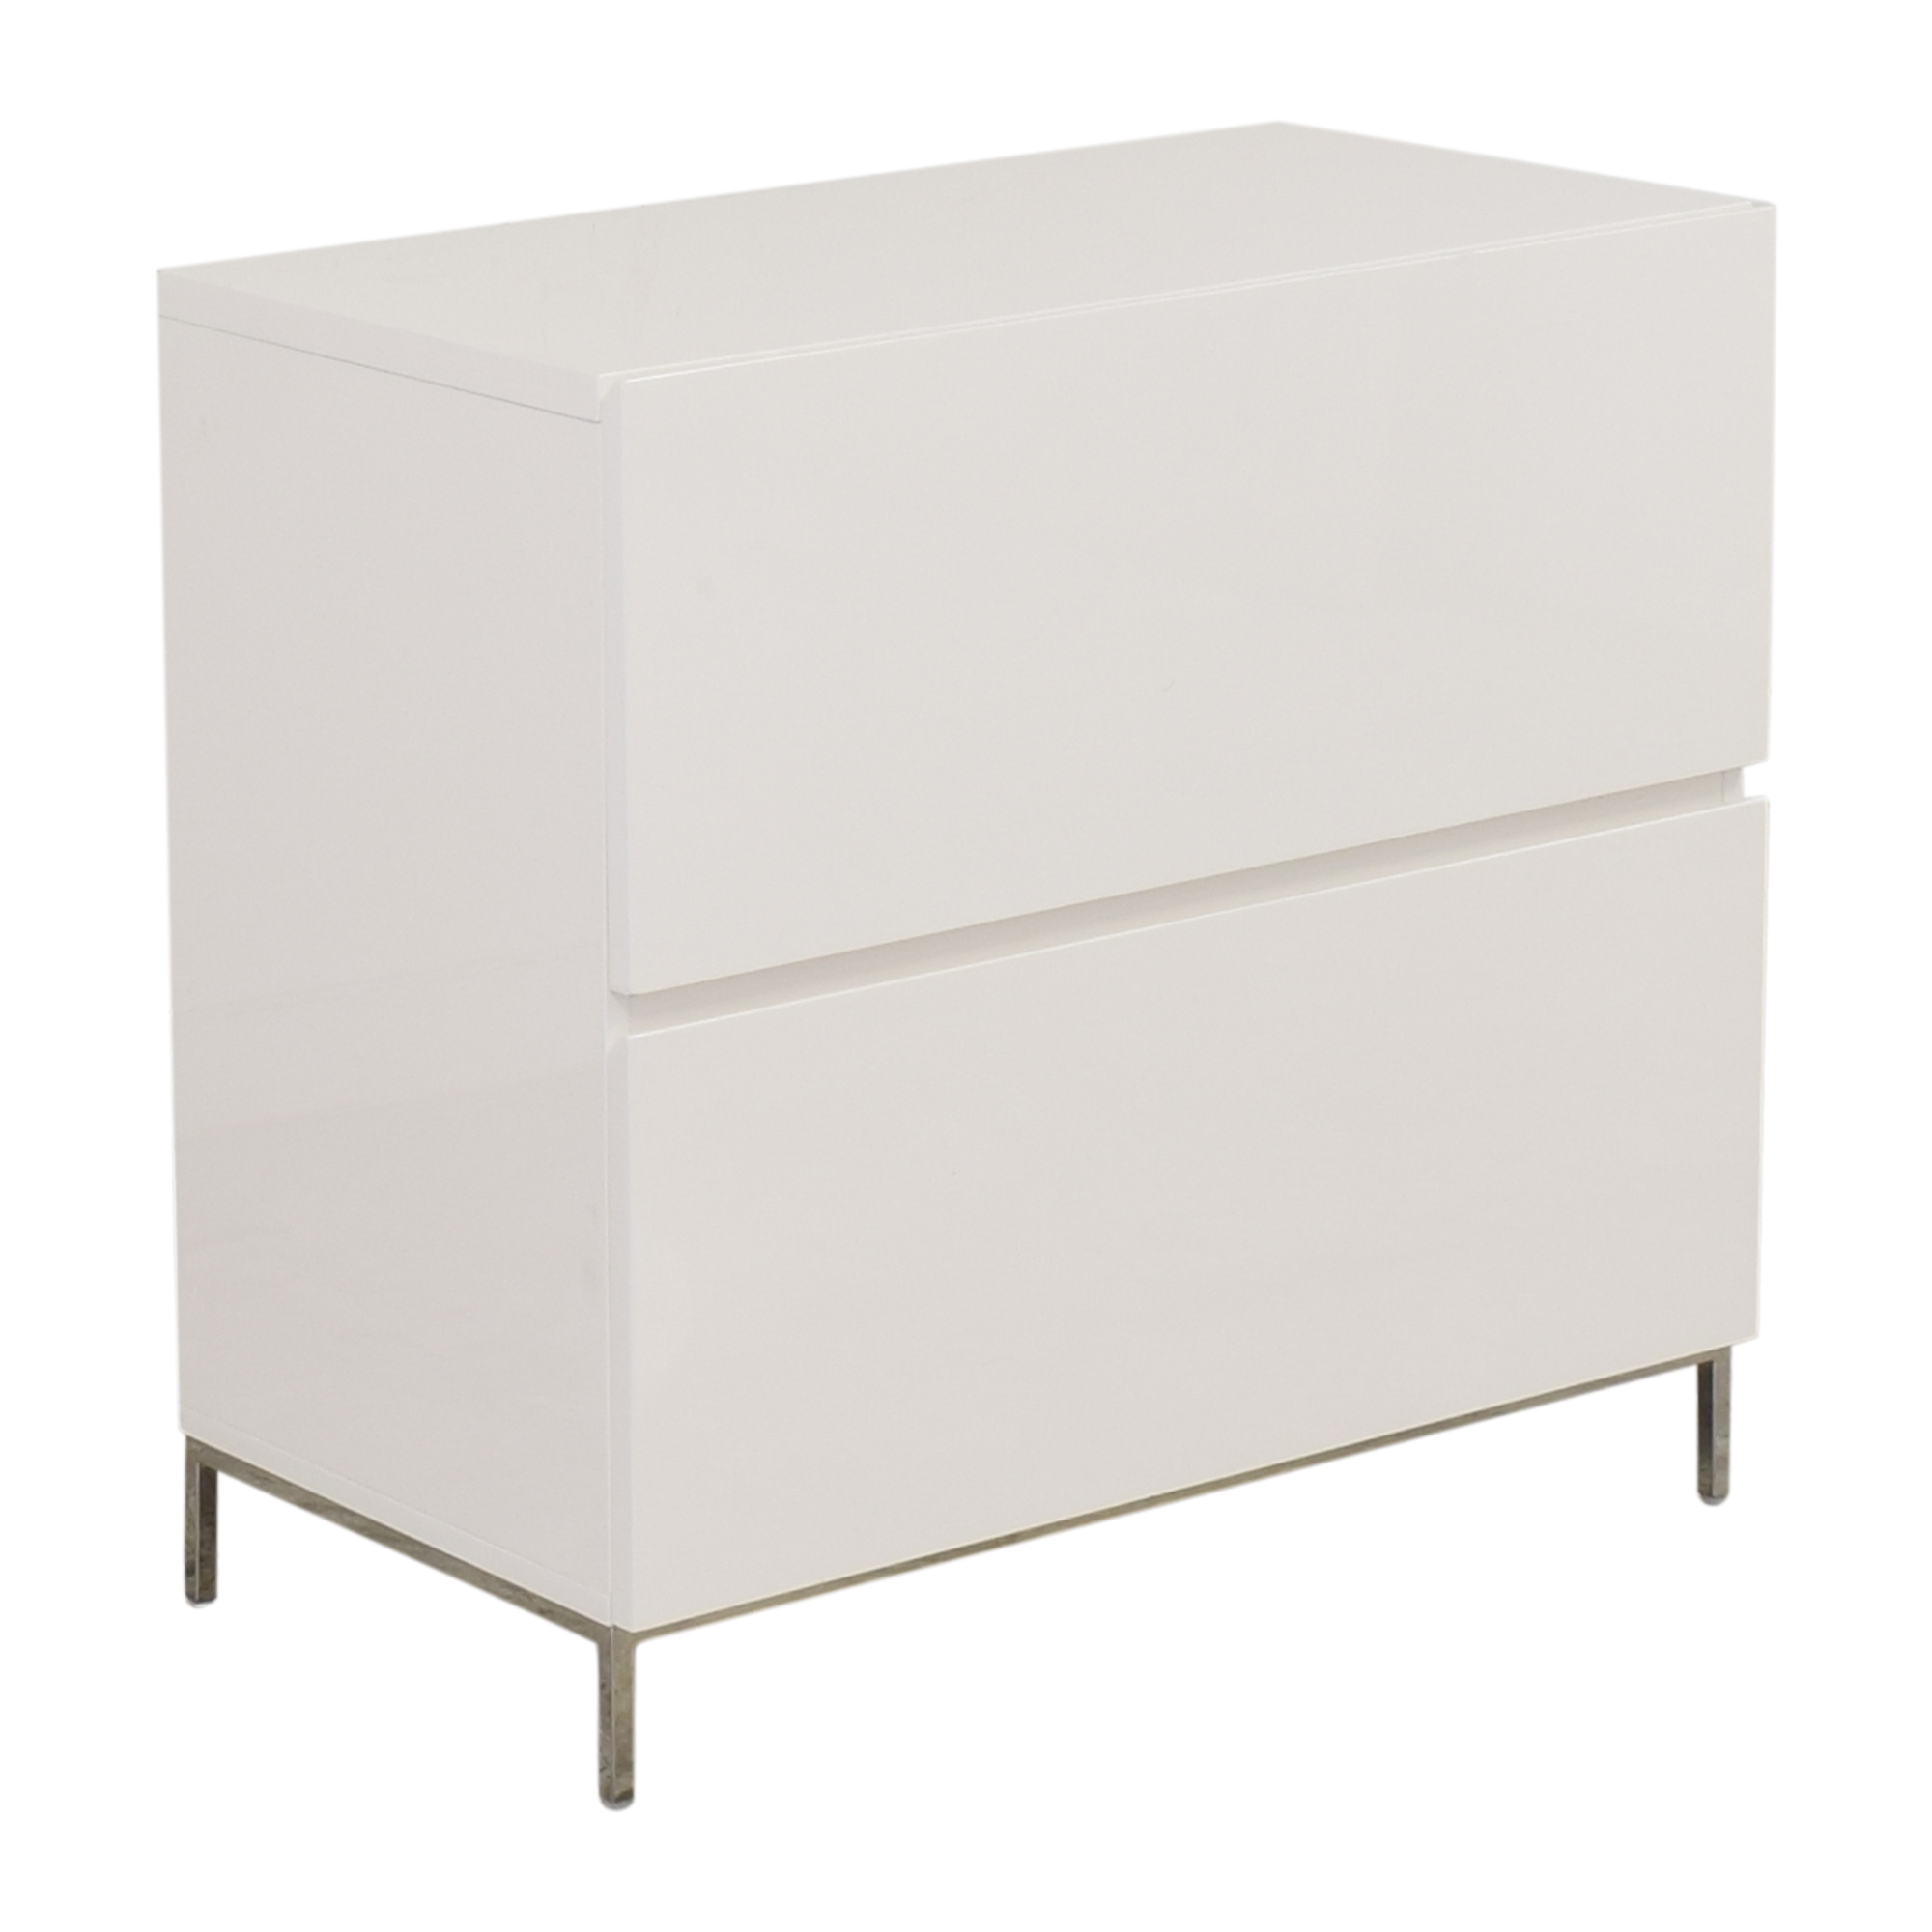 shop West Elm Lacquer Storage Modular Lateral File Cabinet West Elm